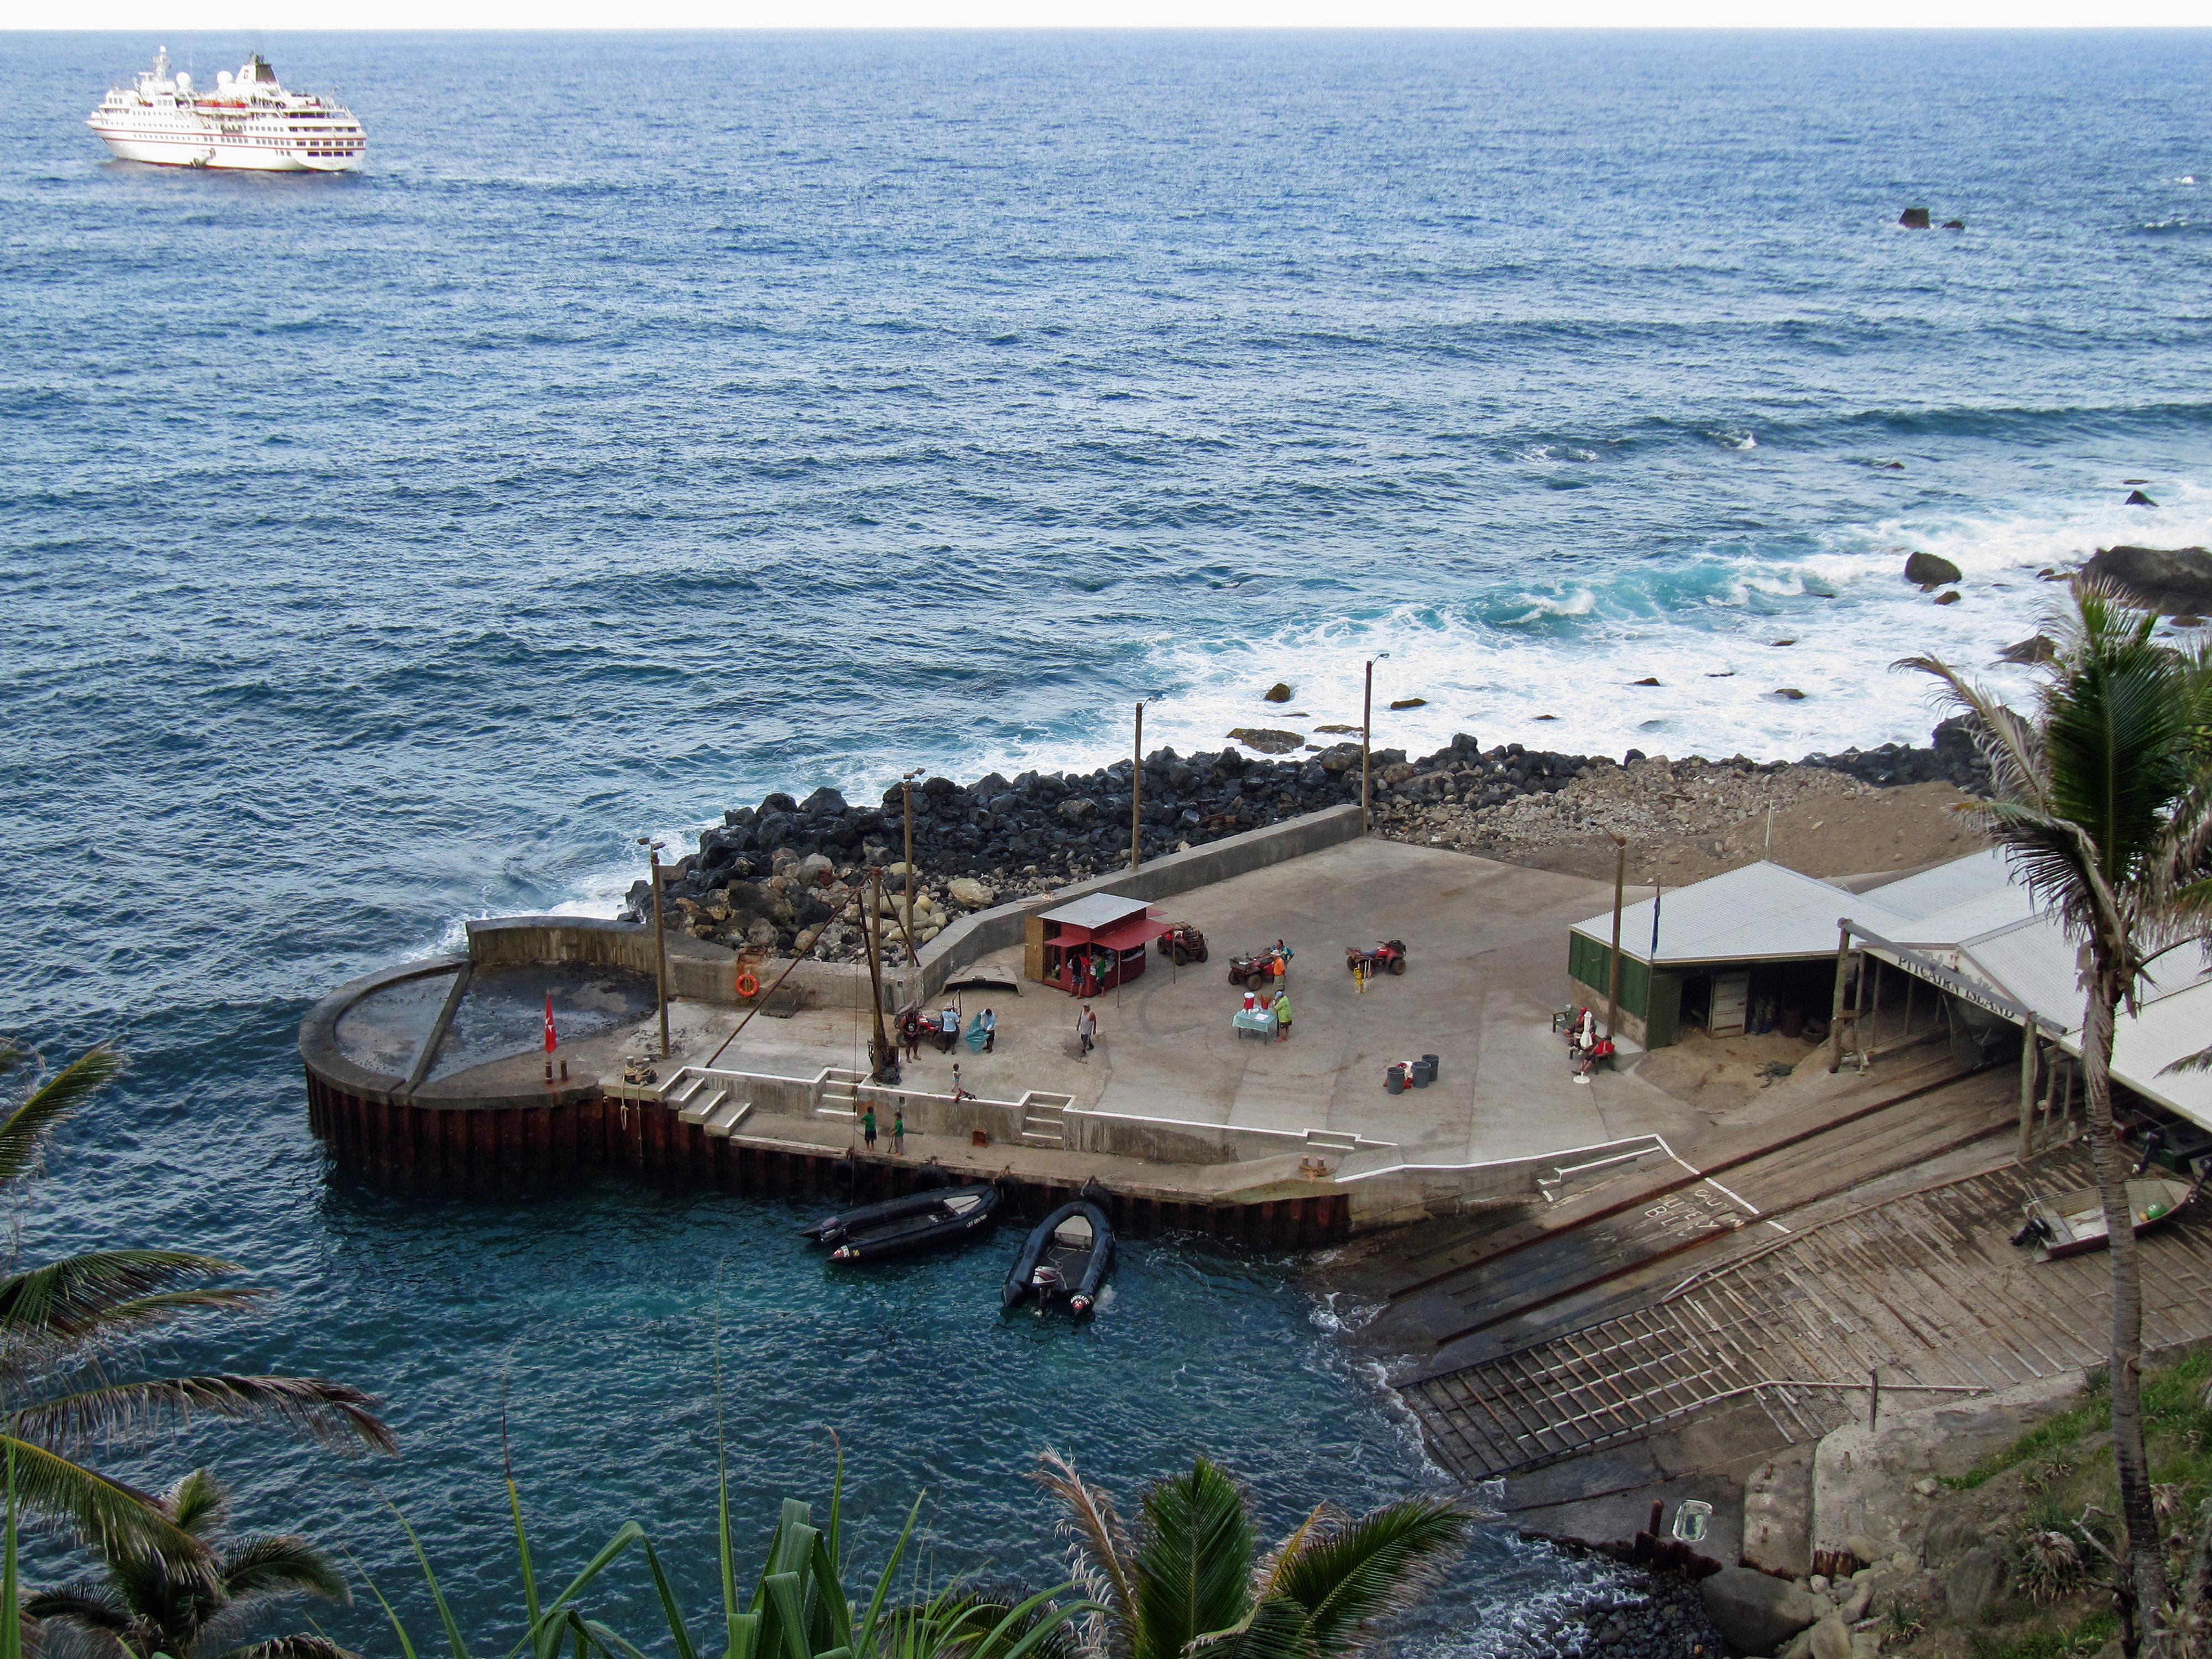 File:Pitcairn Anlegestelle.jpg - Wikimedia Commons